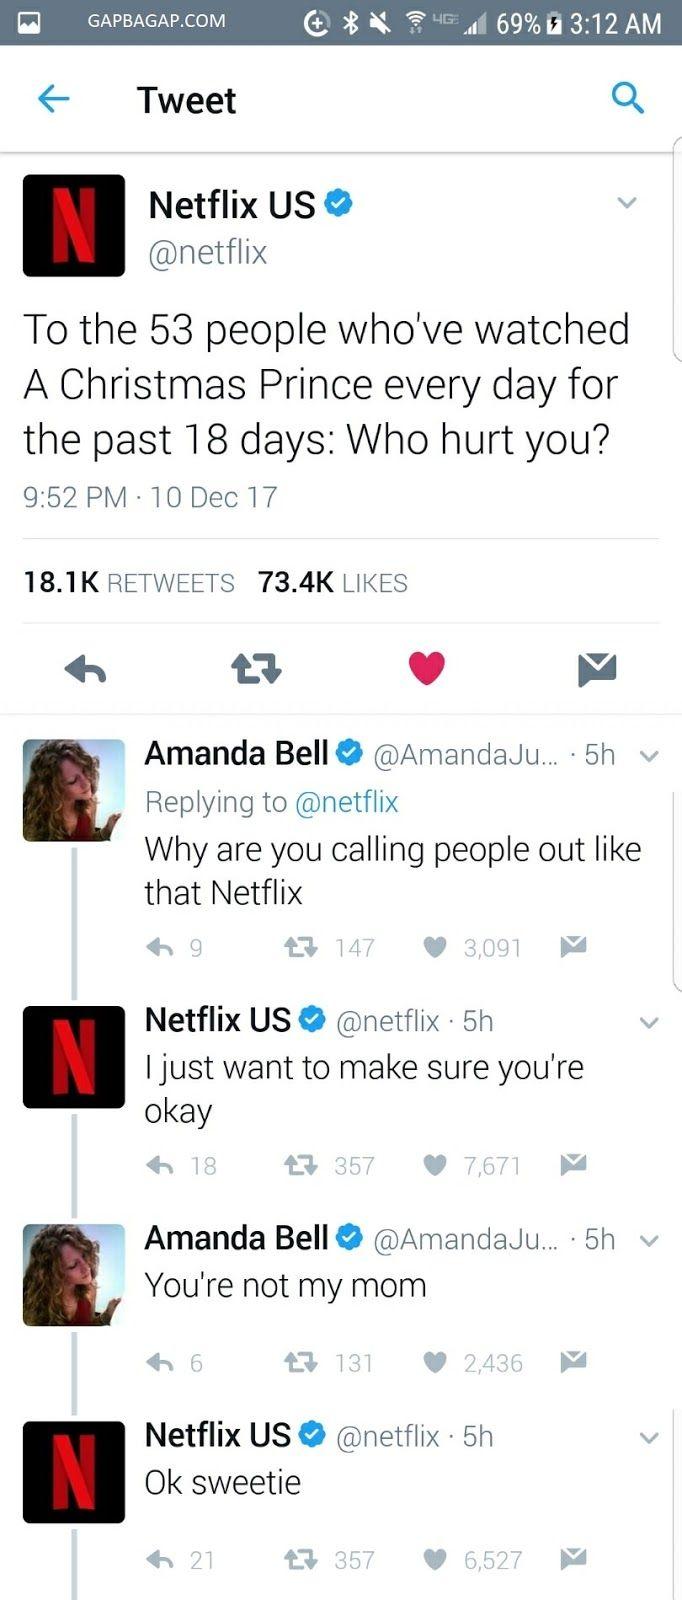 Hilarious Tweets About Netflix vs. Amanda Bell